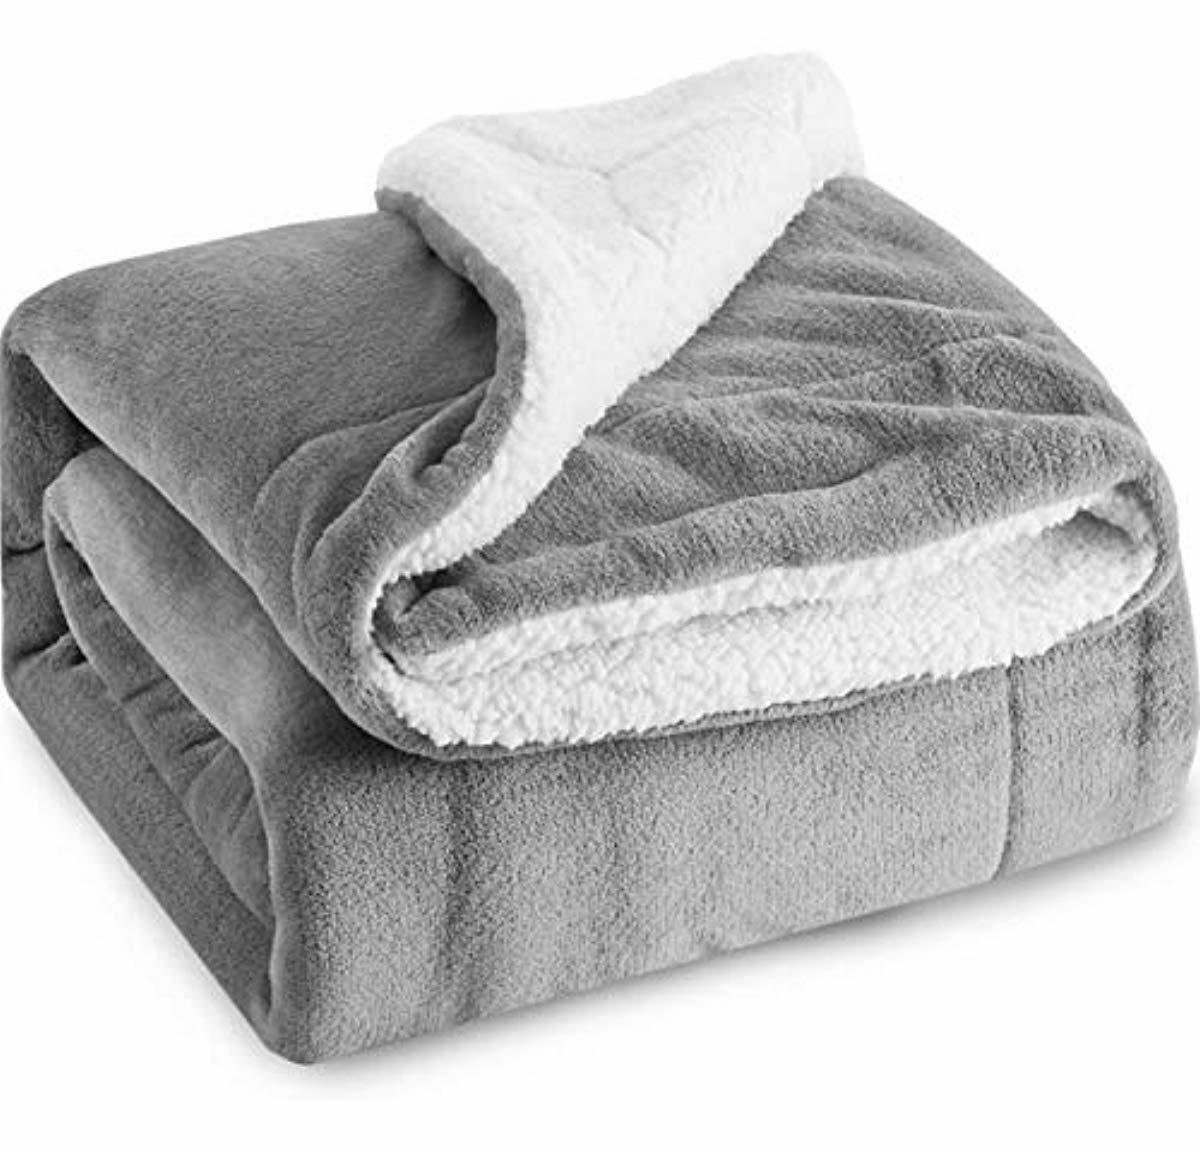 Bedsure Sherpa Throw Blanket grau Twin Größe 60x80 Bedding Fleece Reversible Blan